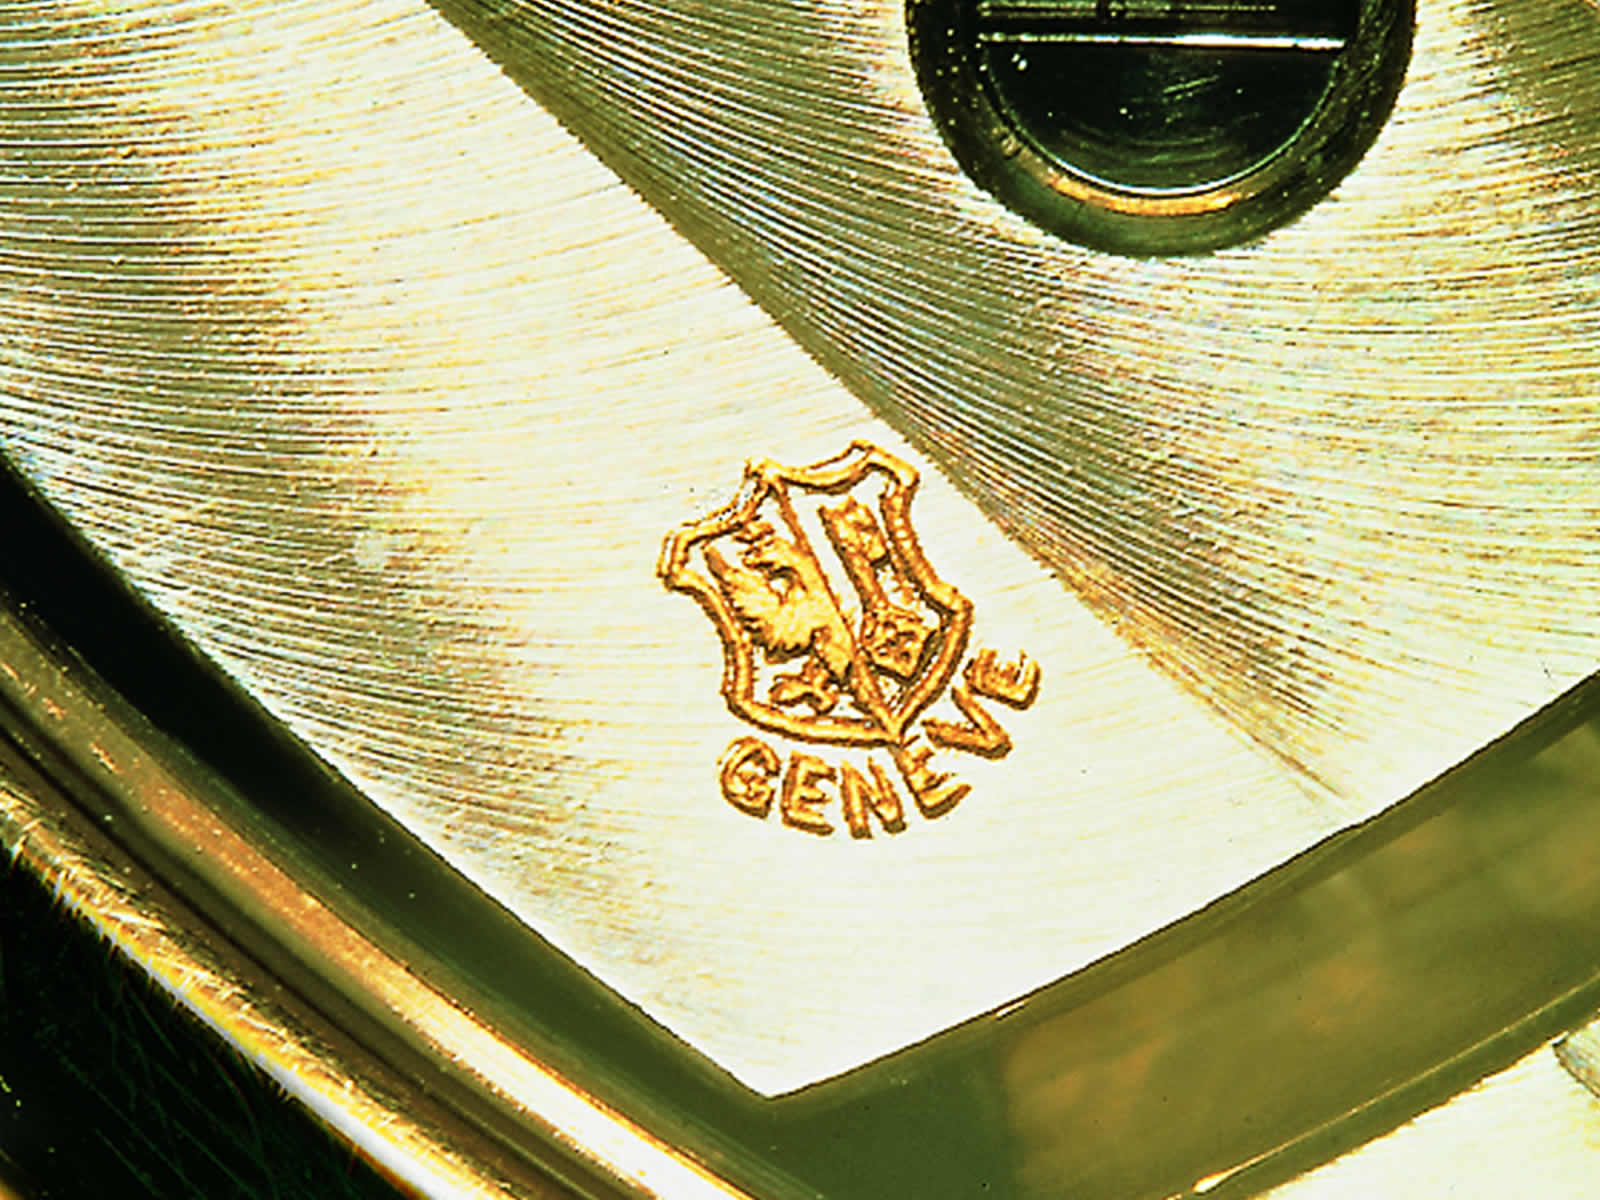 geneva-seal-hallmark-of-geneva-patek-philippe-seal-10-.jpg